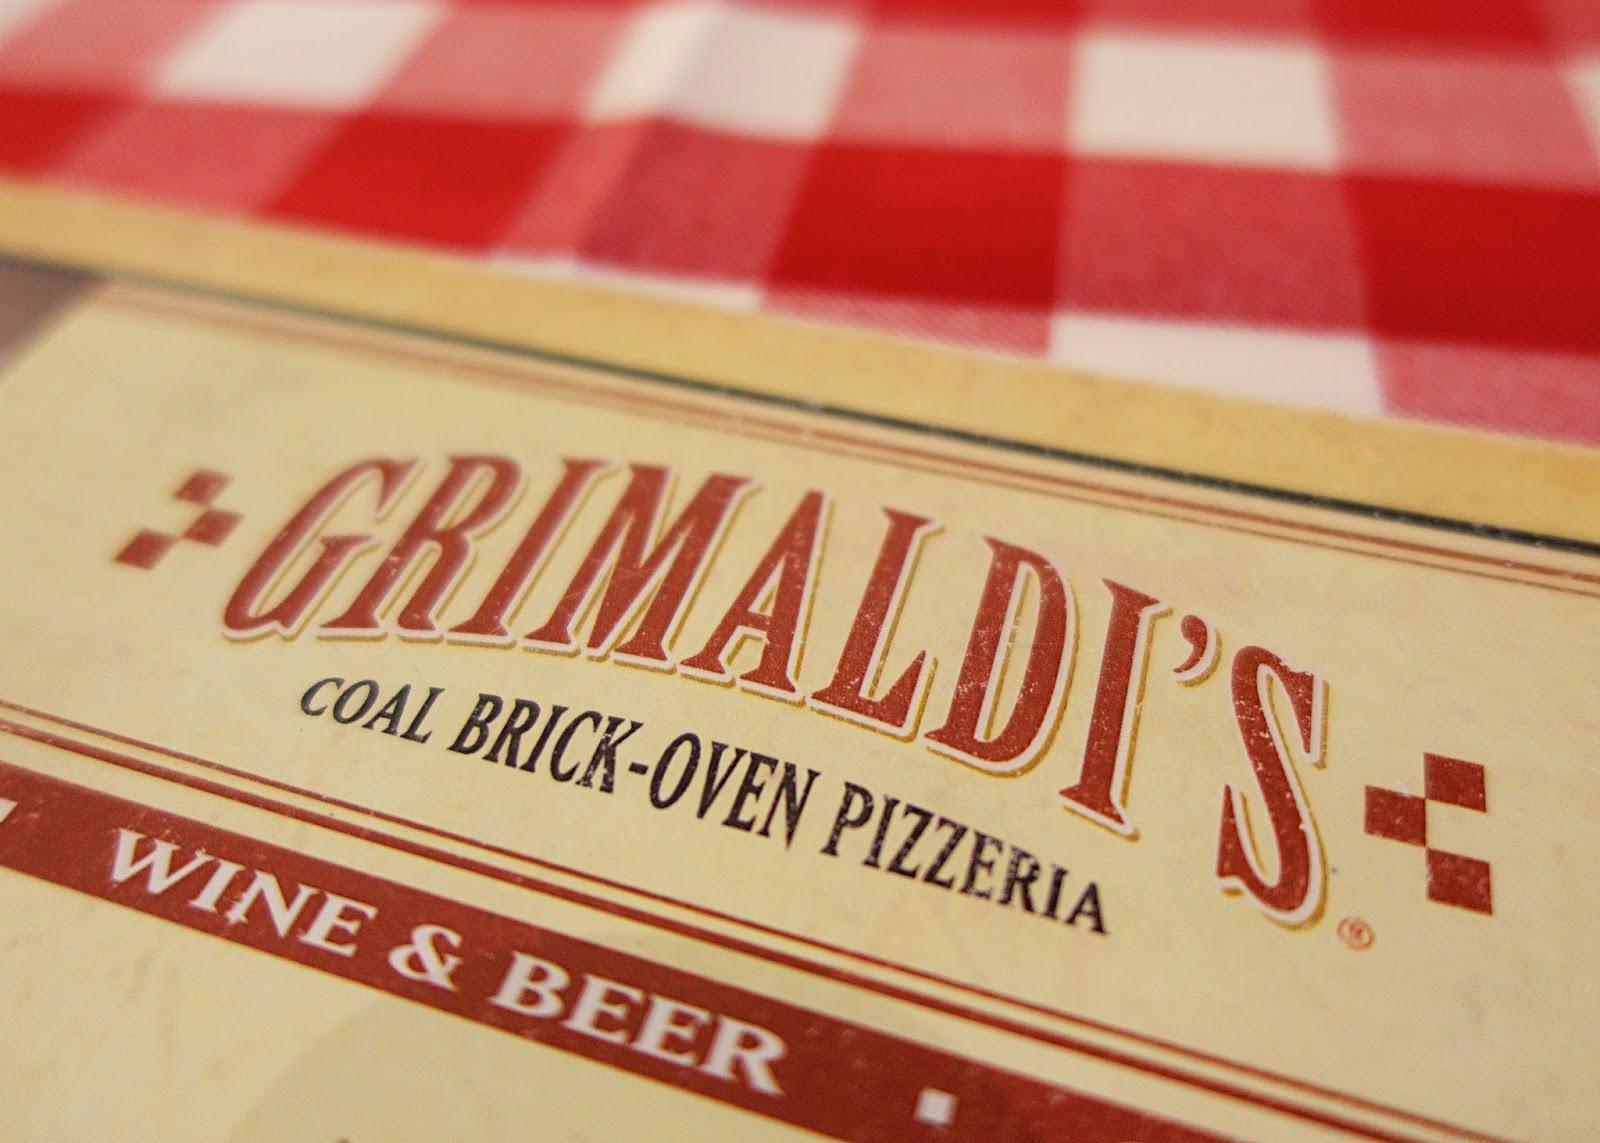 Grimaldi's Las Vegas